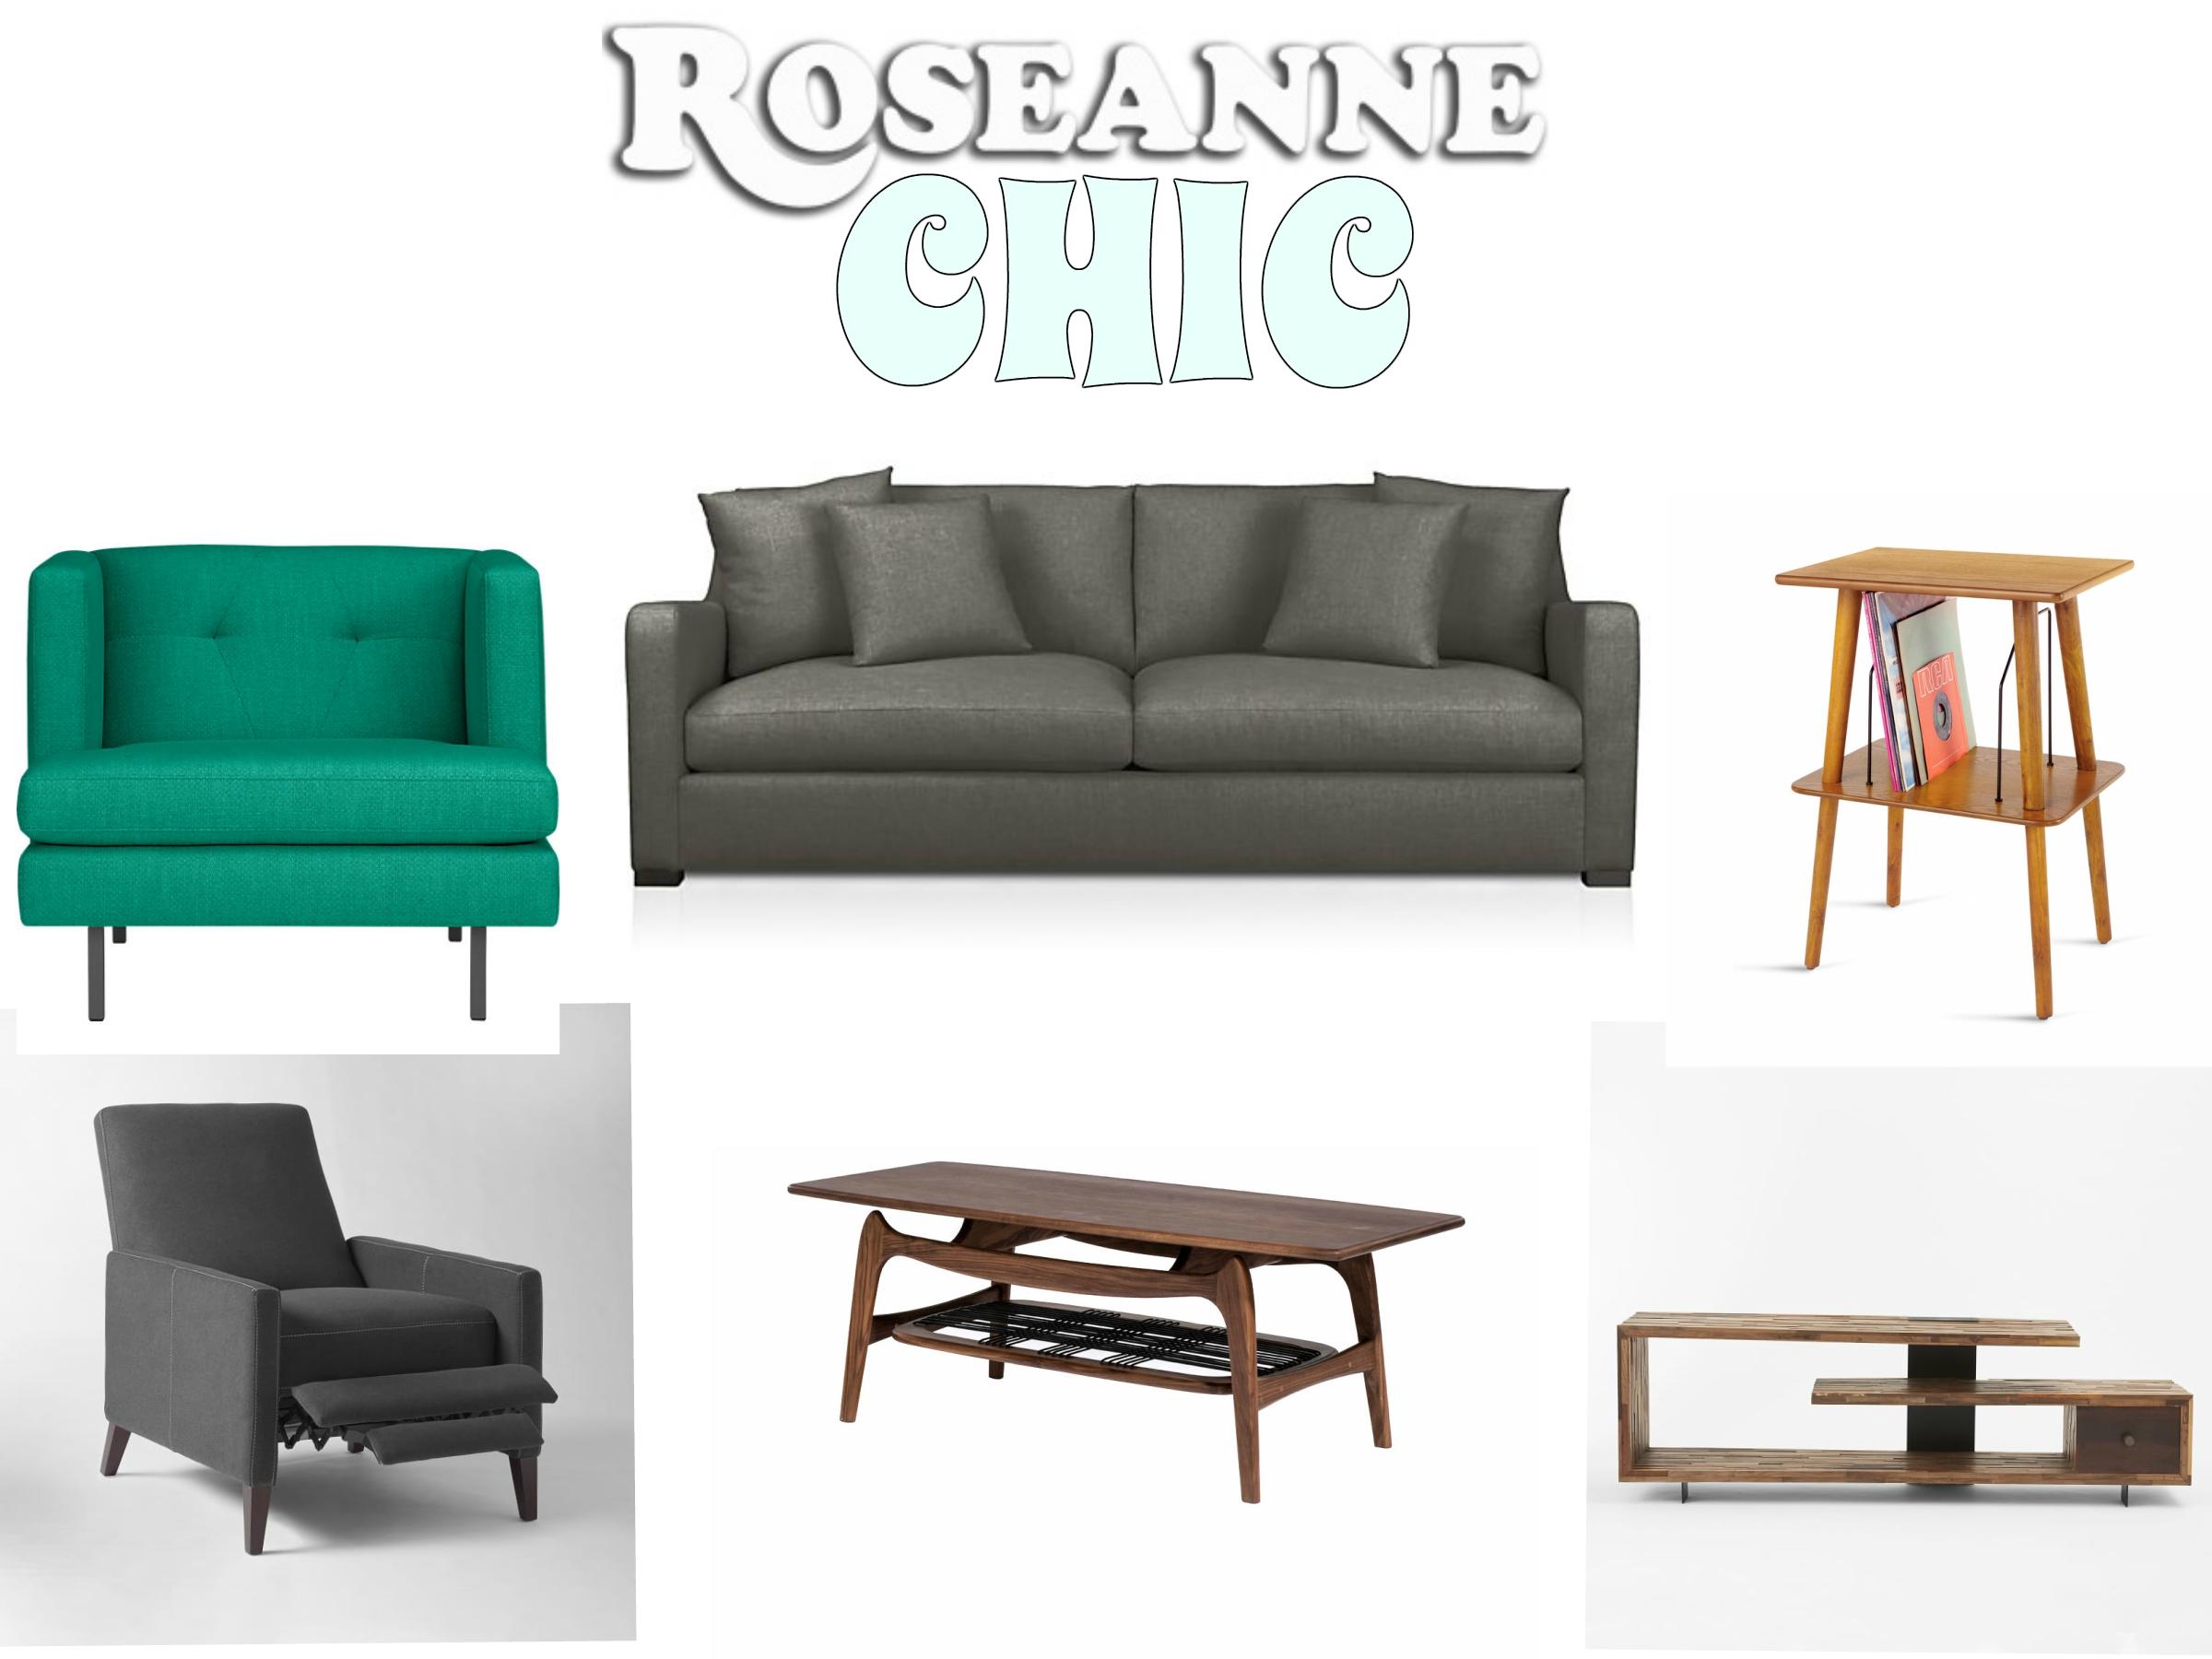 roseannechic2